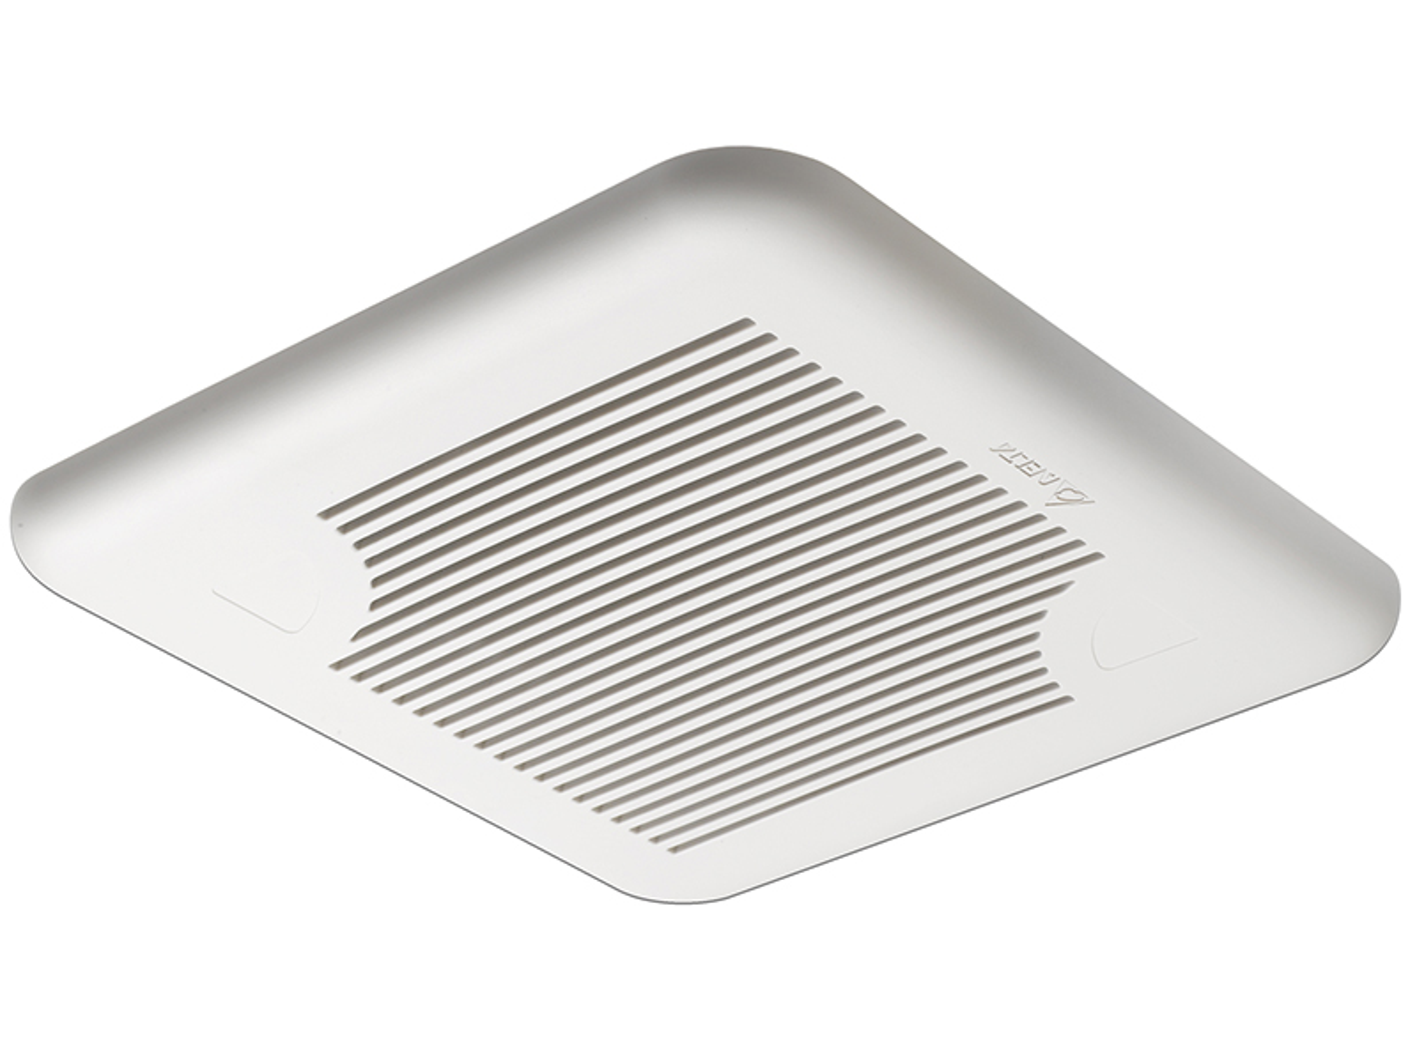 SIG110D fan grille